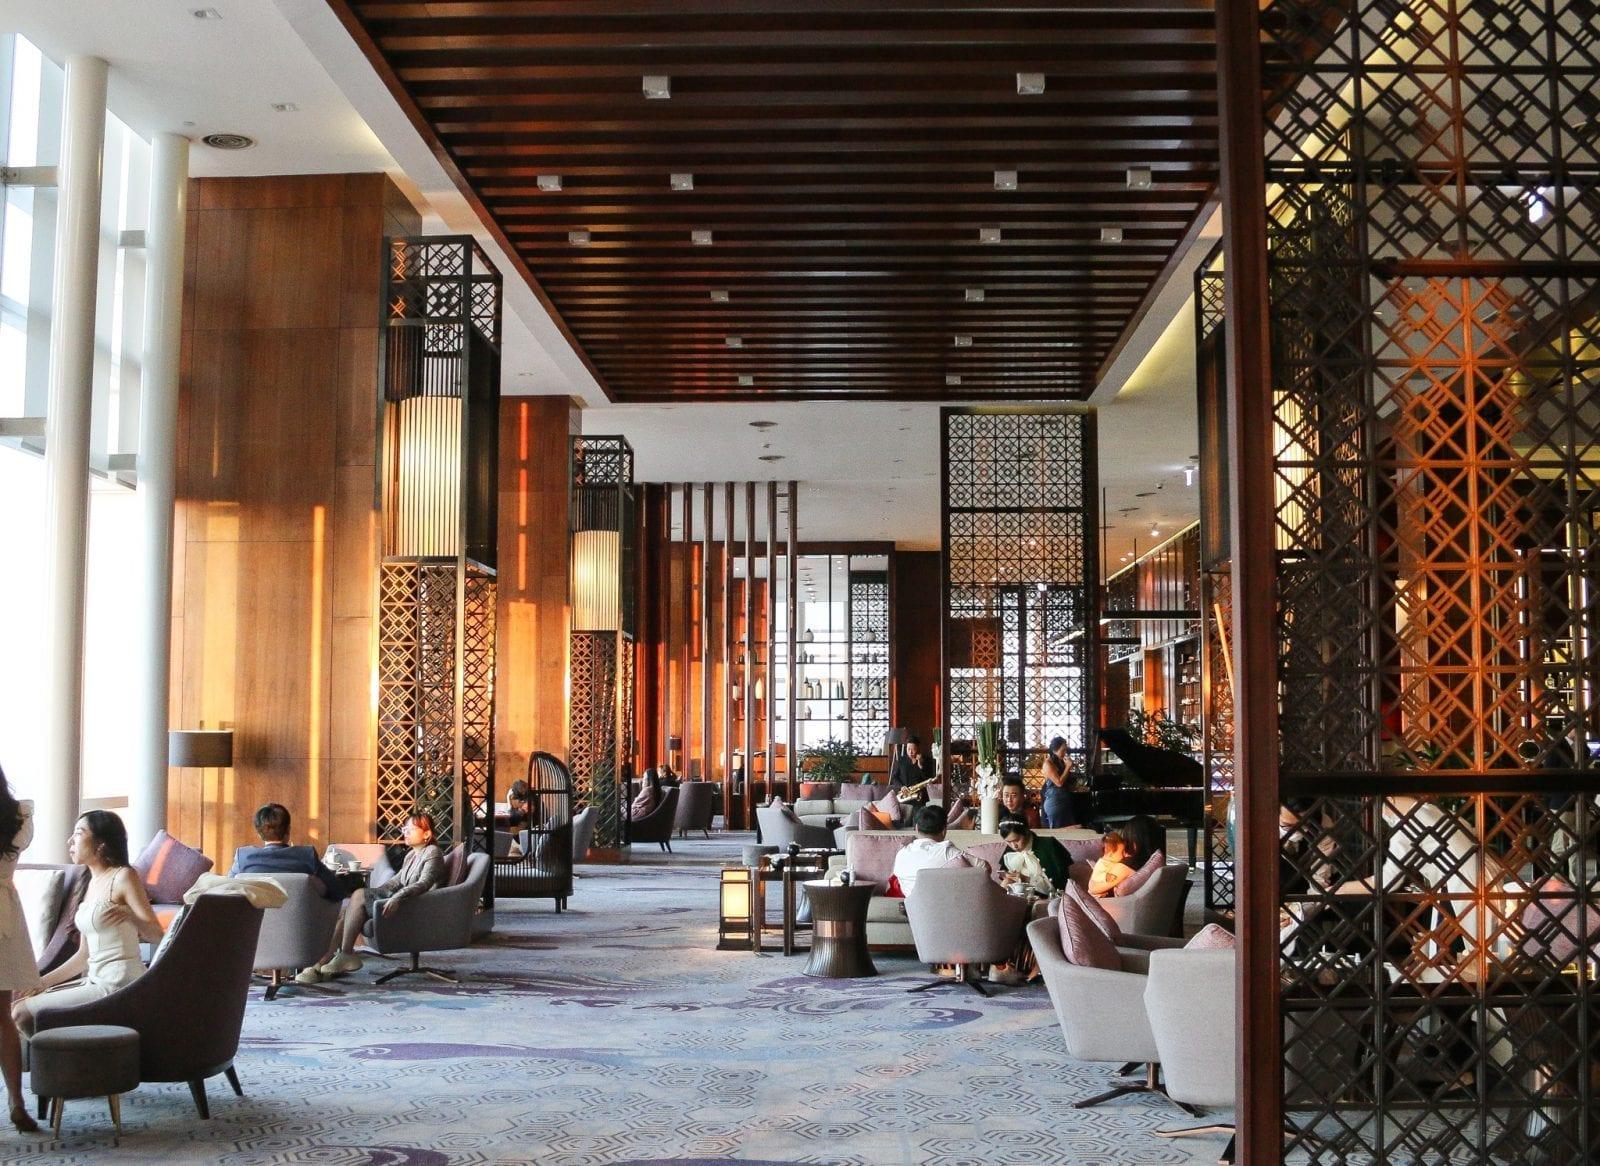 Image of the InterContinental Hotel it Landmark 72 in Hanoi, Vietnam